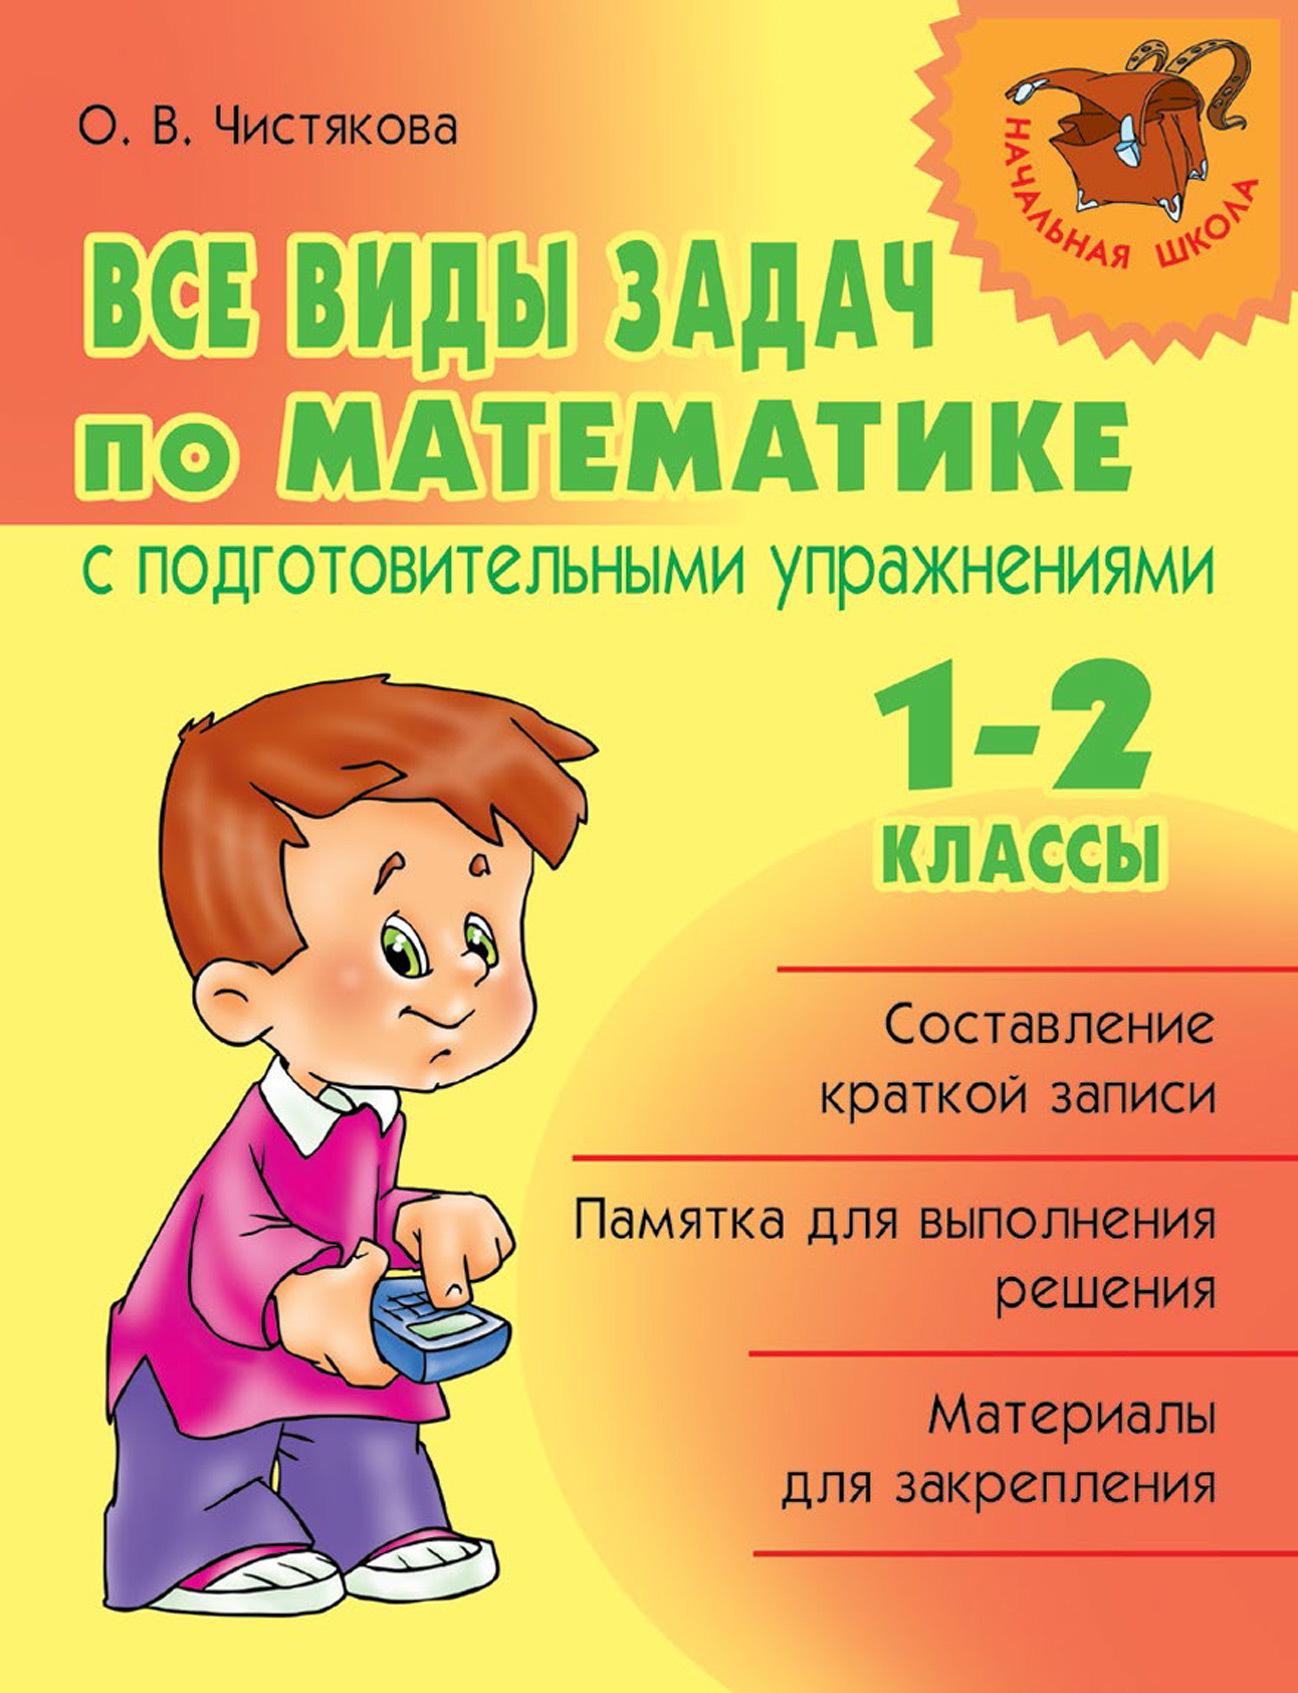 Решение задач по математике онлайн без регистрации решение задач по кинематике 11 класс